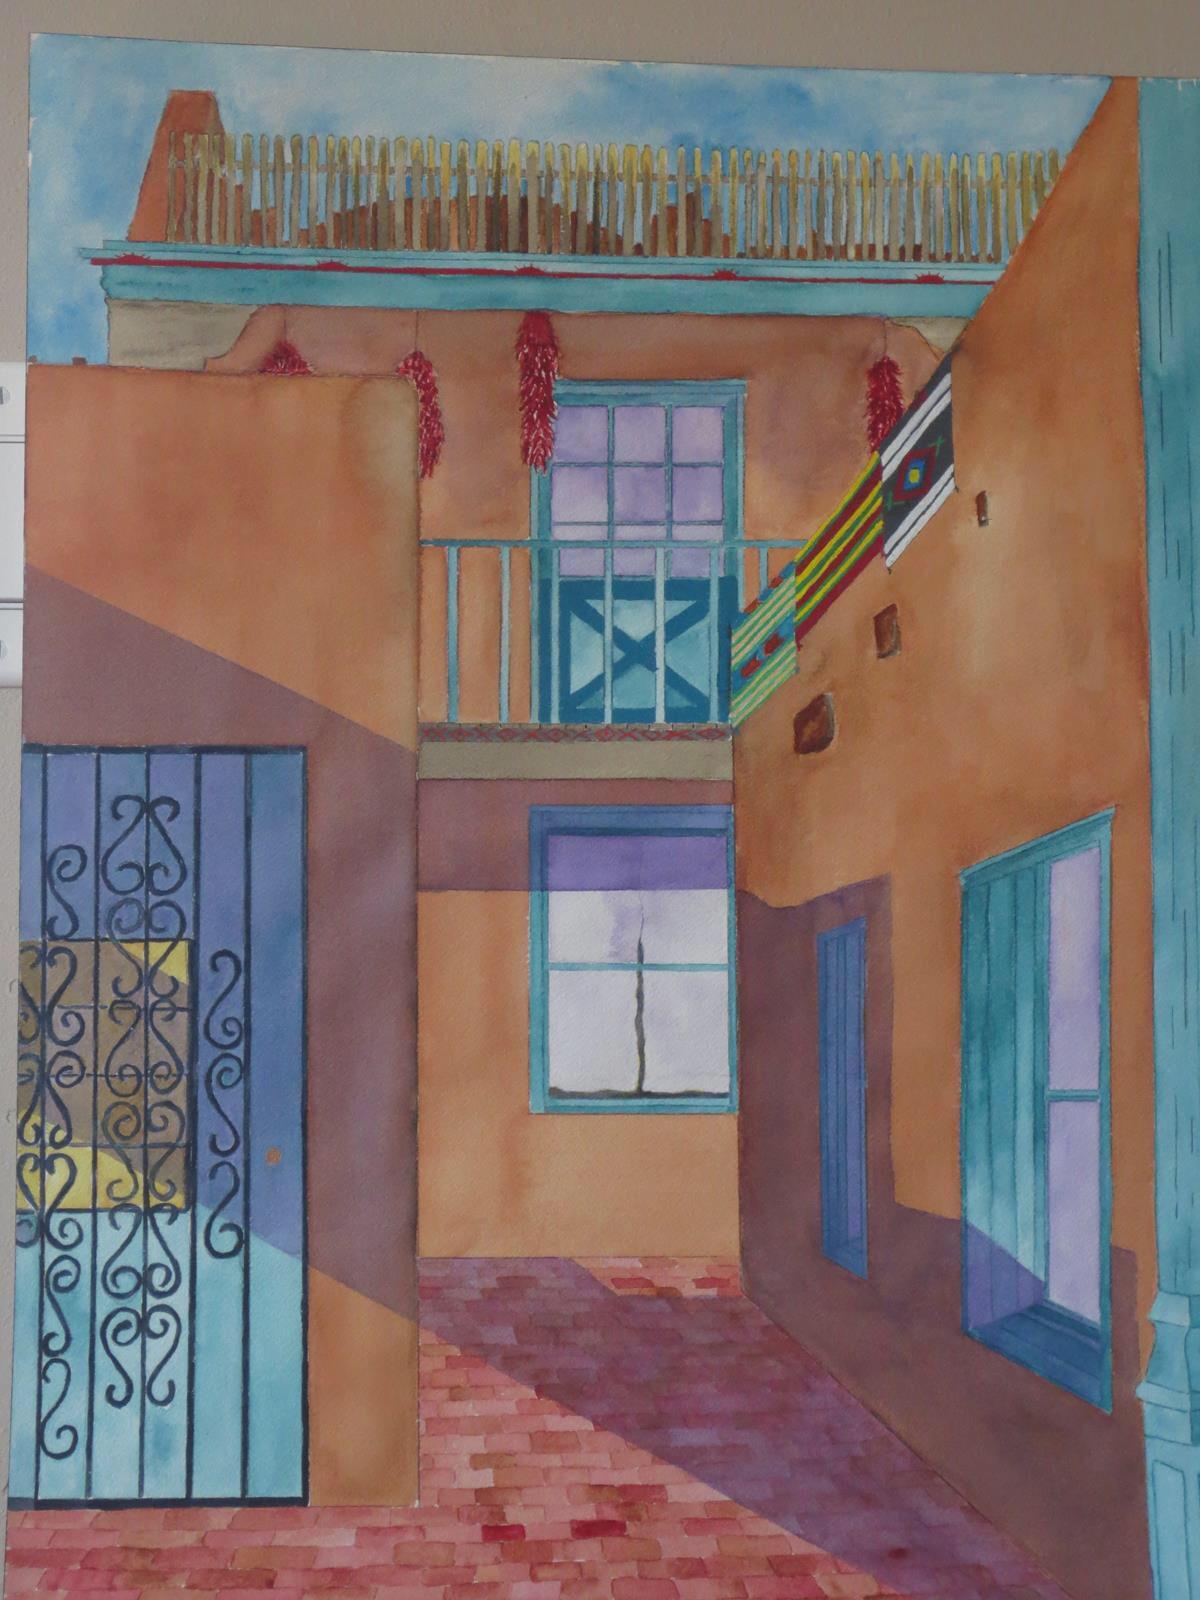 """Las Vegas , New Mexico"" 2011. Watercolor by Colin Claxon"